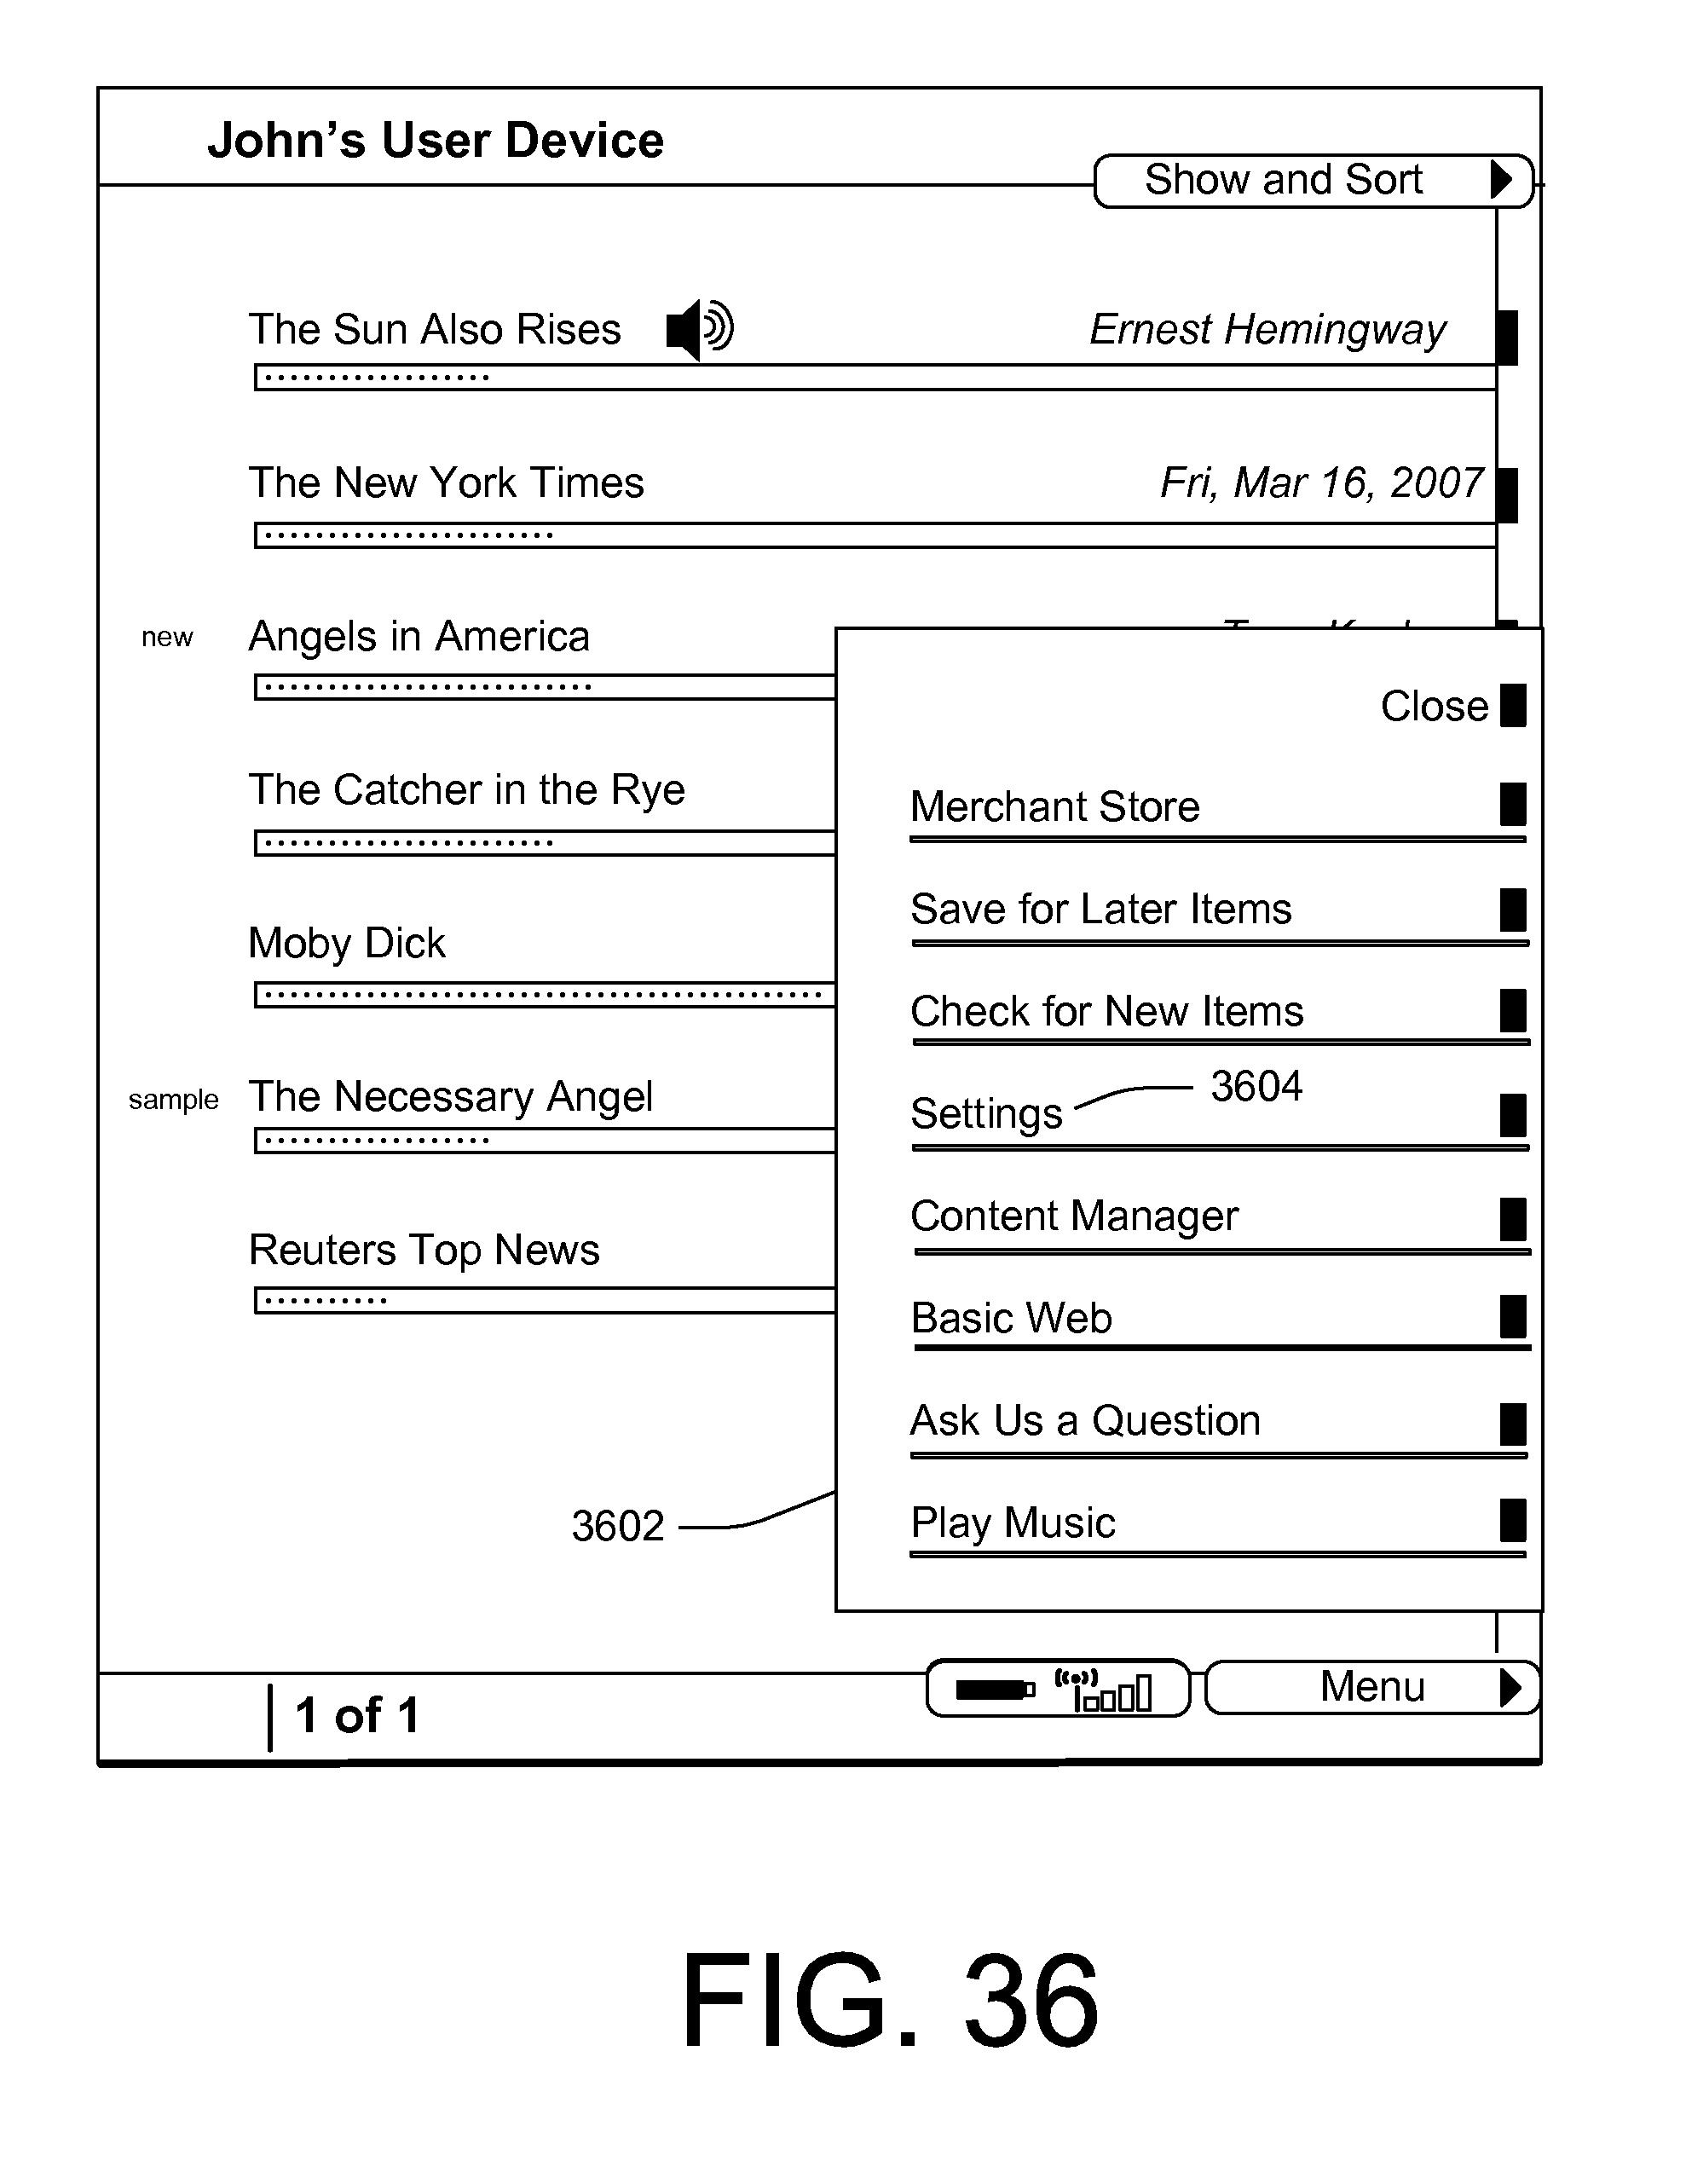 Patent US 9,888,005 B1